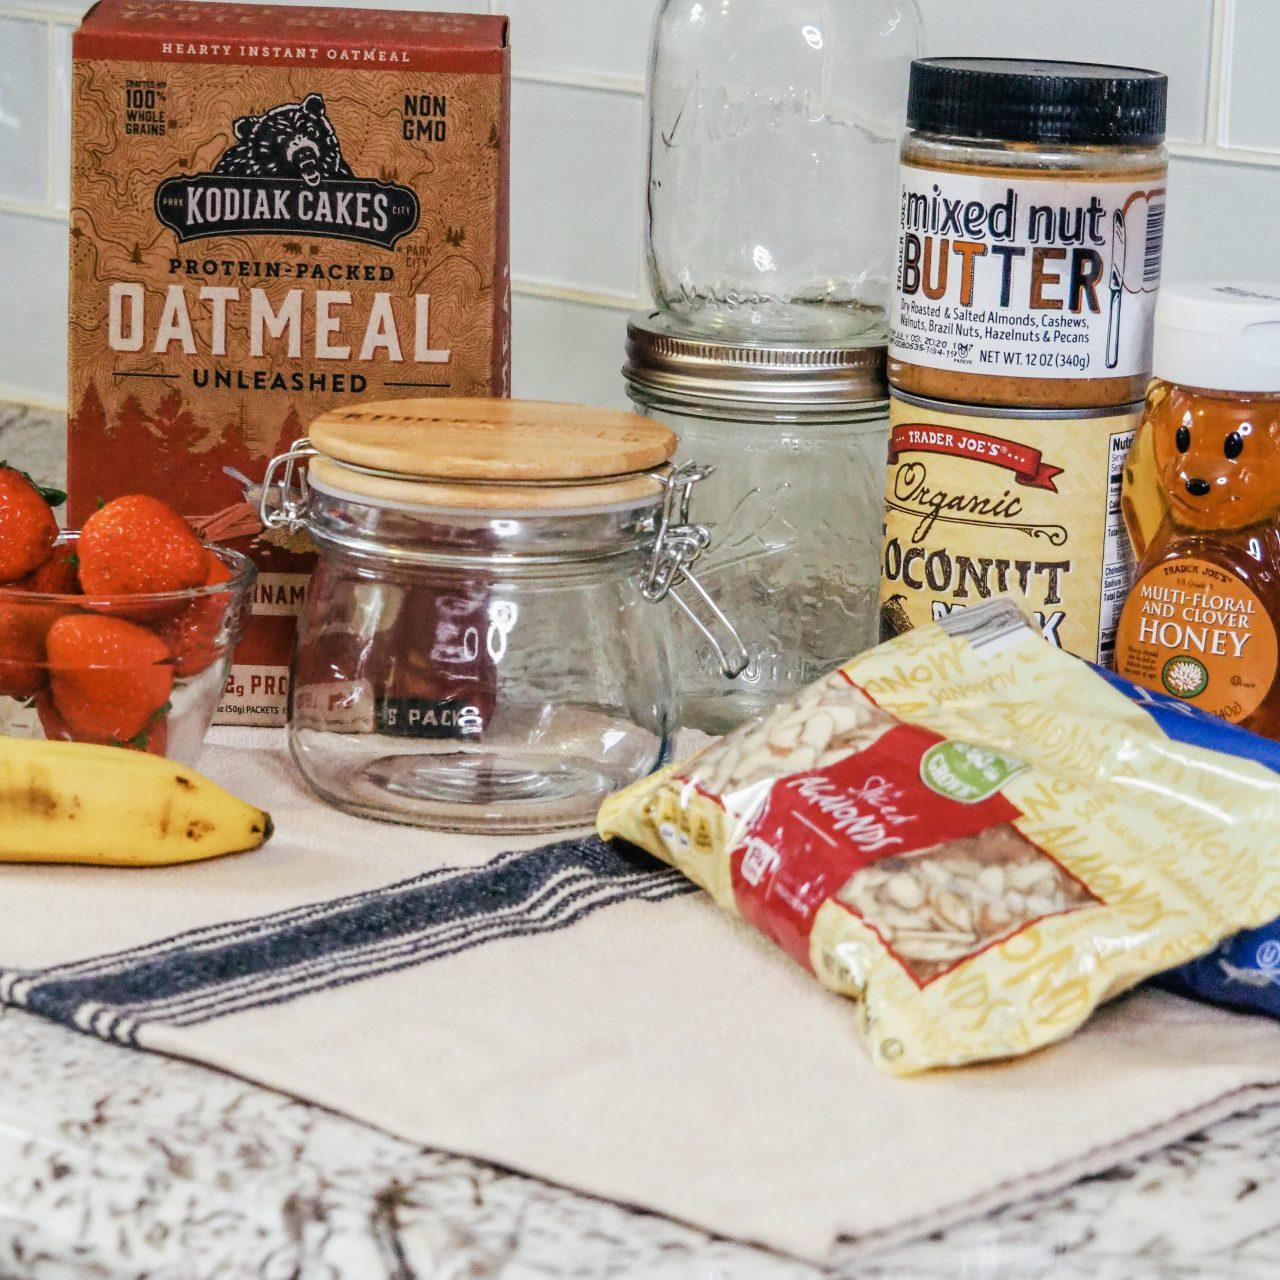 Easy Overnight Oats with Kodiak Cakes Oatmeal